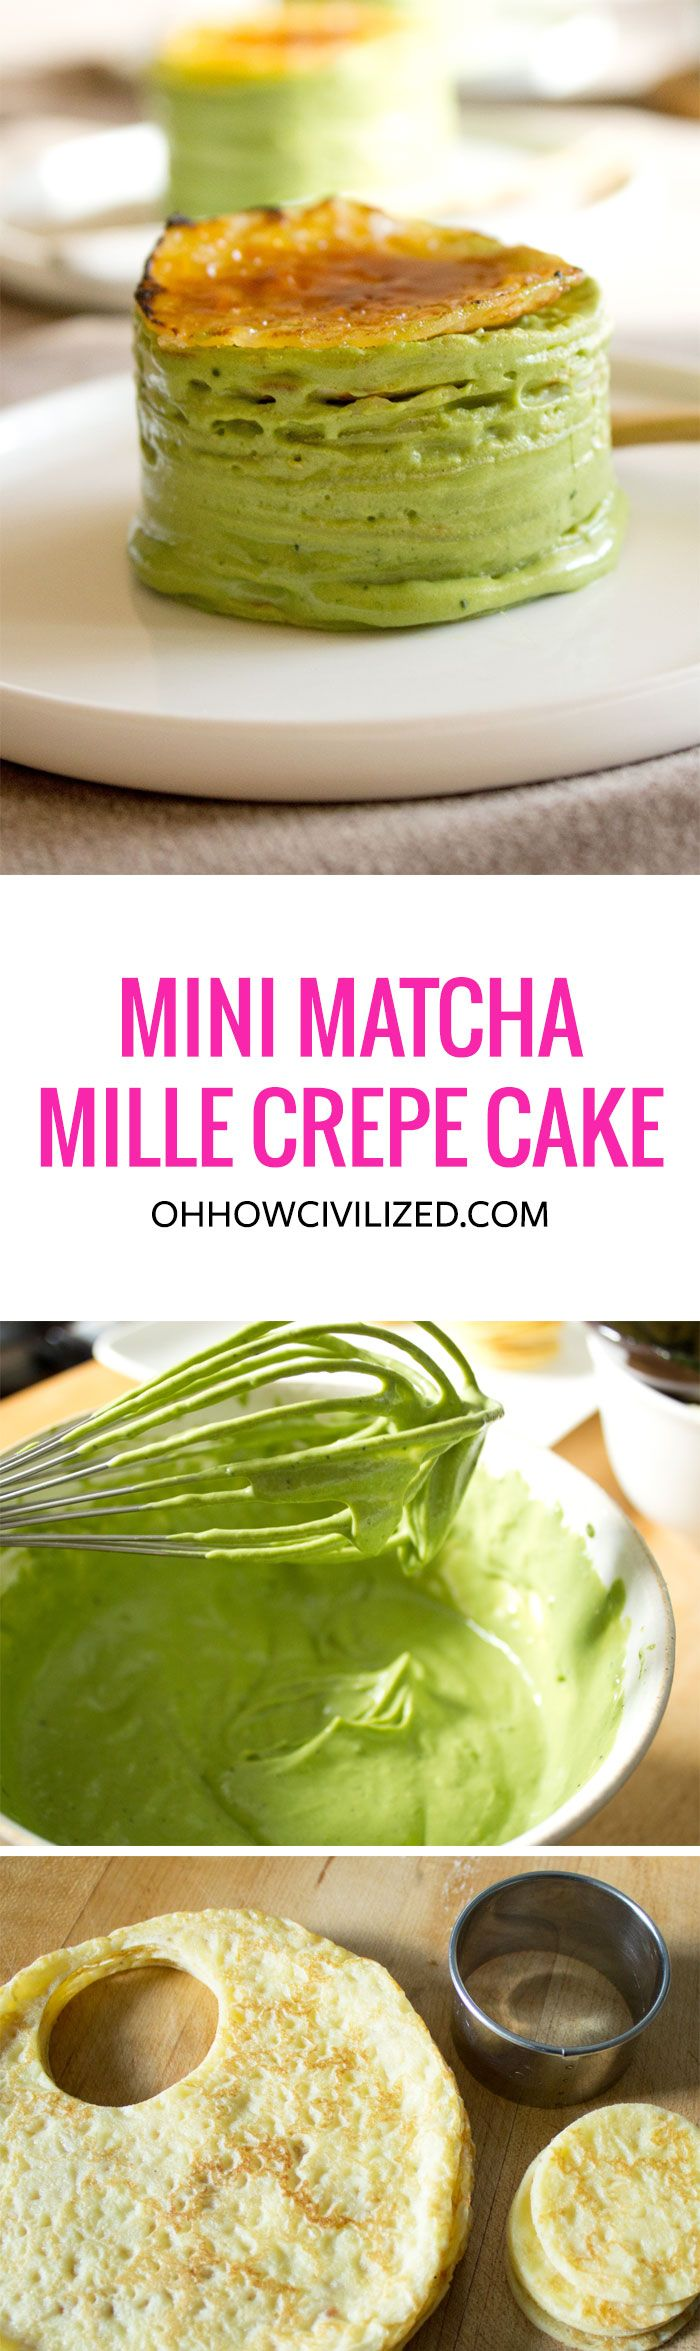 Mini #Matcha (Green Tea) Mille Crepe Cake